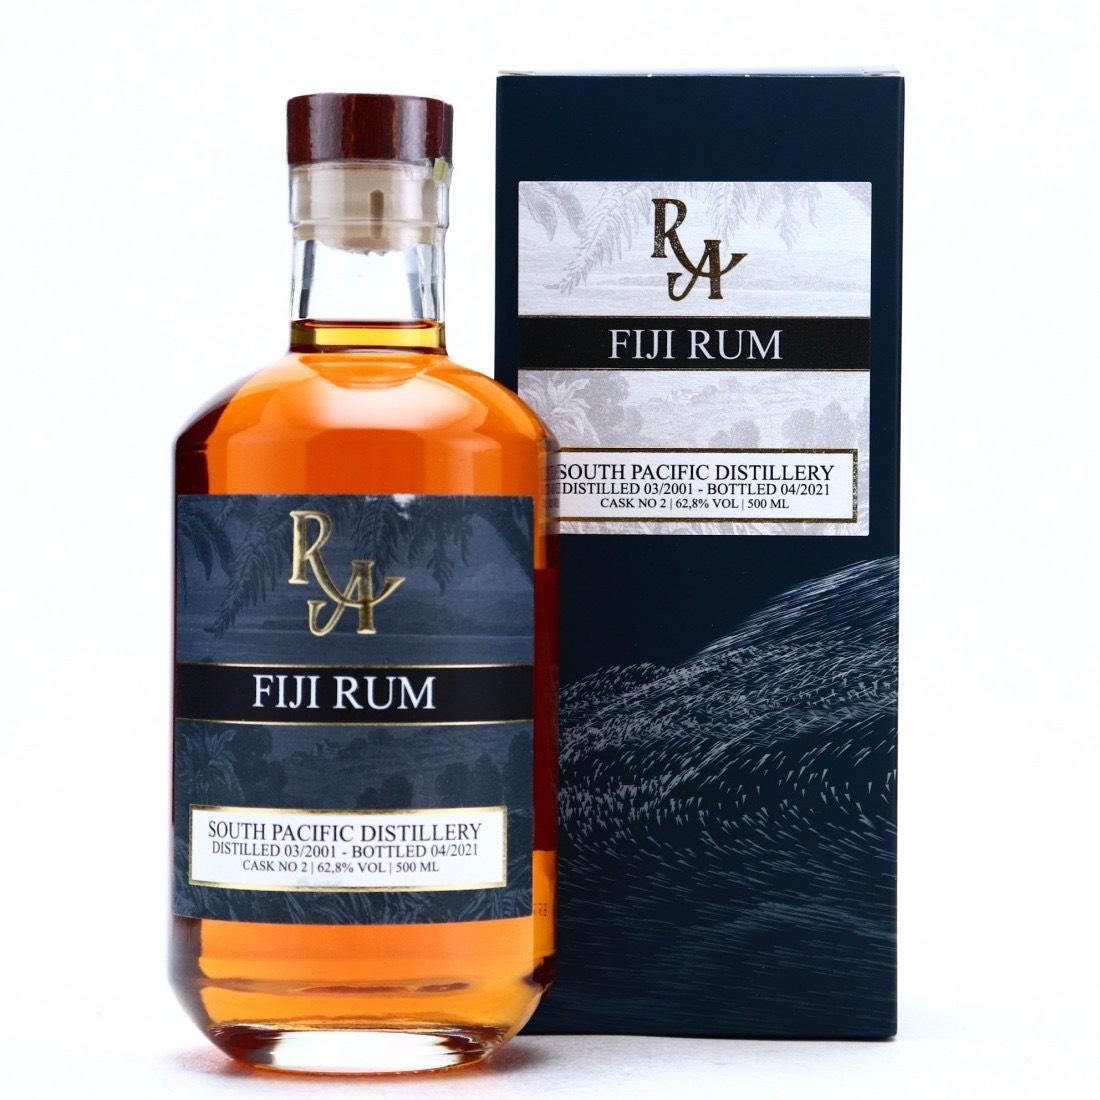 Bottle image of Rum Artesanal Fiji Rum